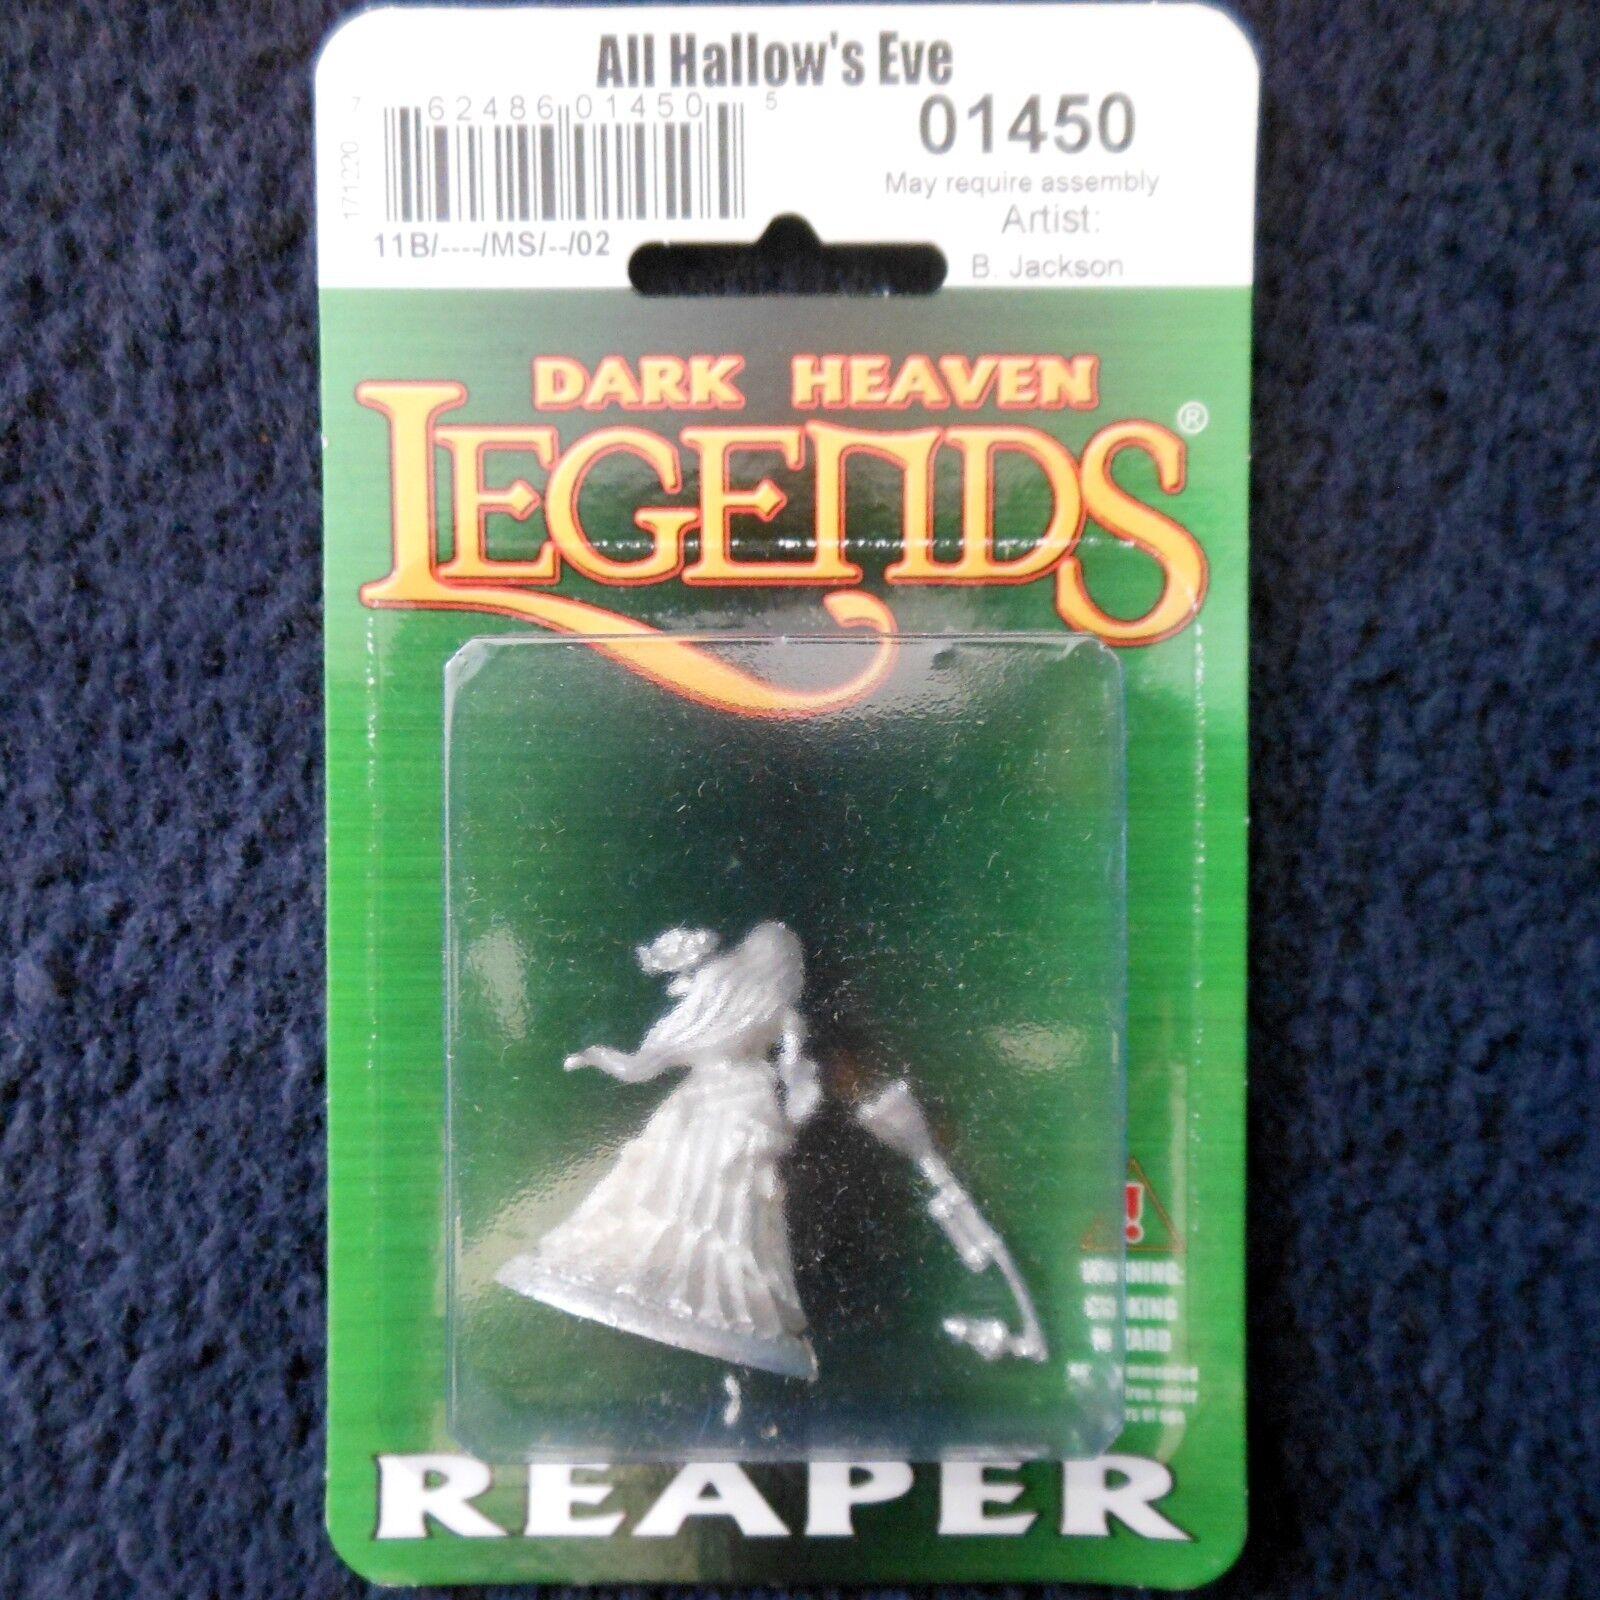 Reaper Dark Heaven Legends 01450 All Hallow's Eve Witch Female Sorceress  Druid